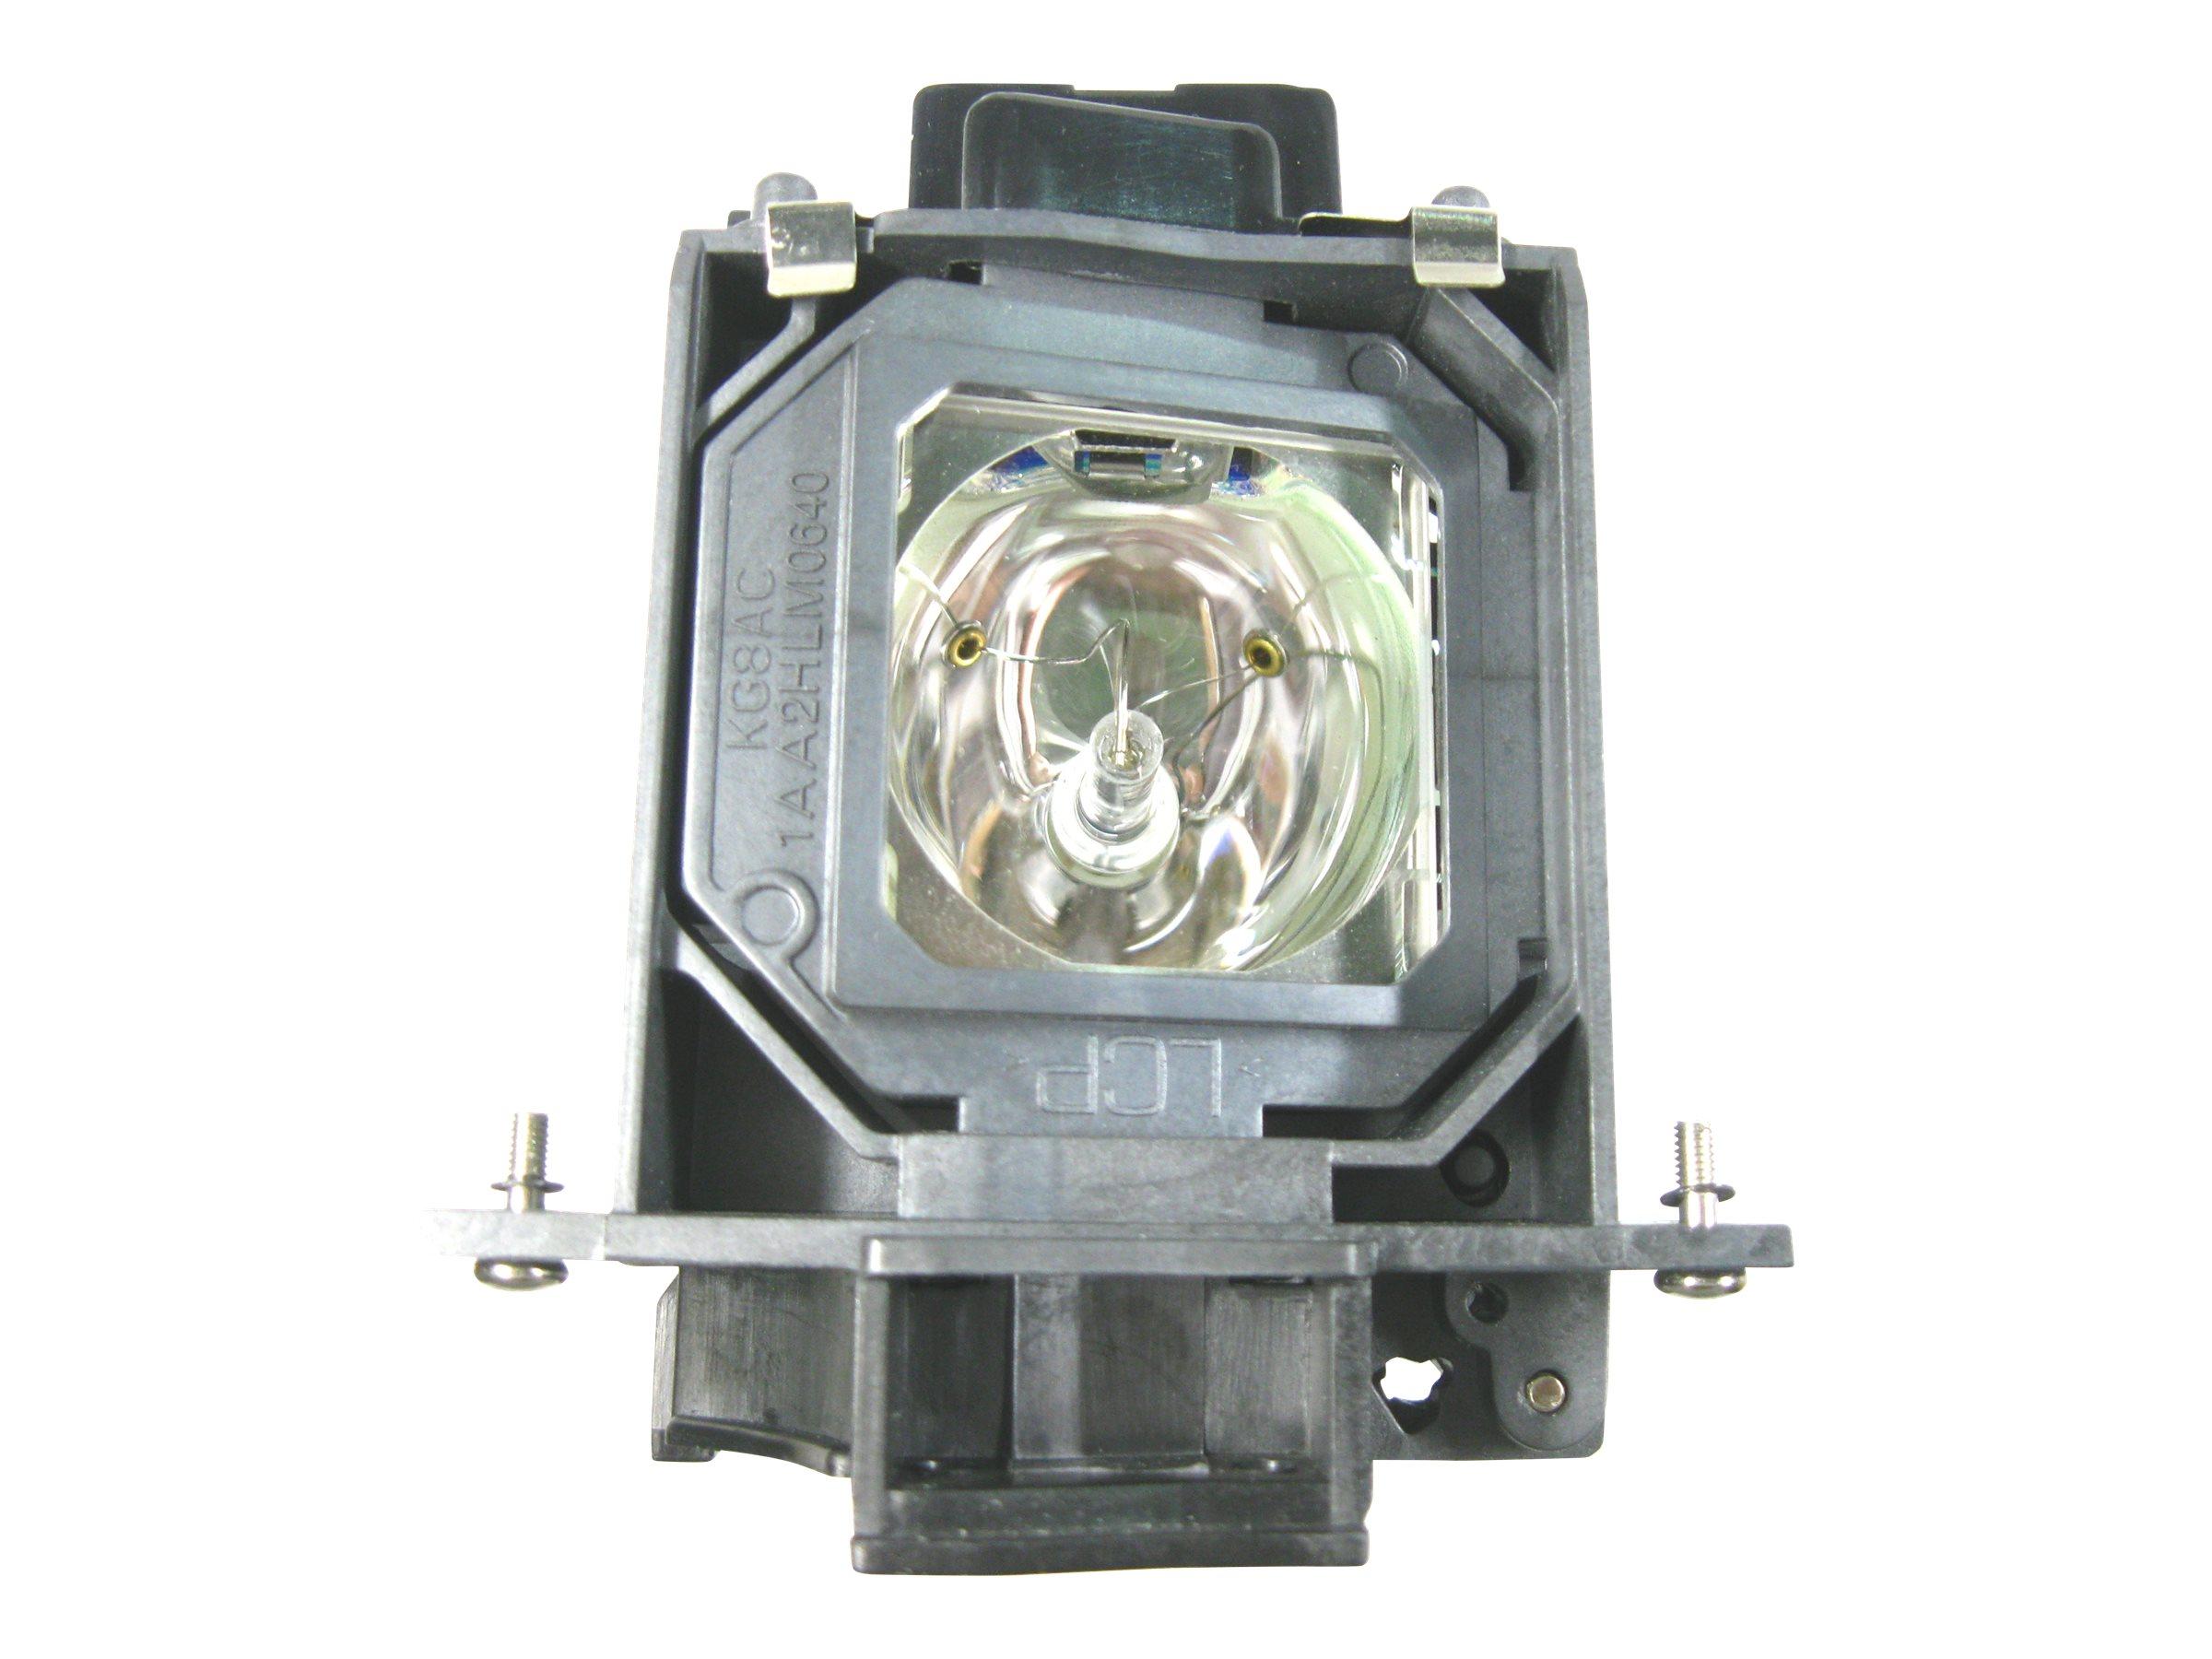 V7 - Projektorlampe (gleichwertig mit: ET-LAC100, Sanyo POA-LMP143) - 3000 Stunden - OEM - für Panasonic PT-CW230E, CW230EA, CW2